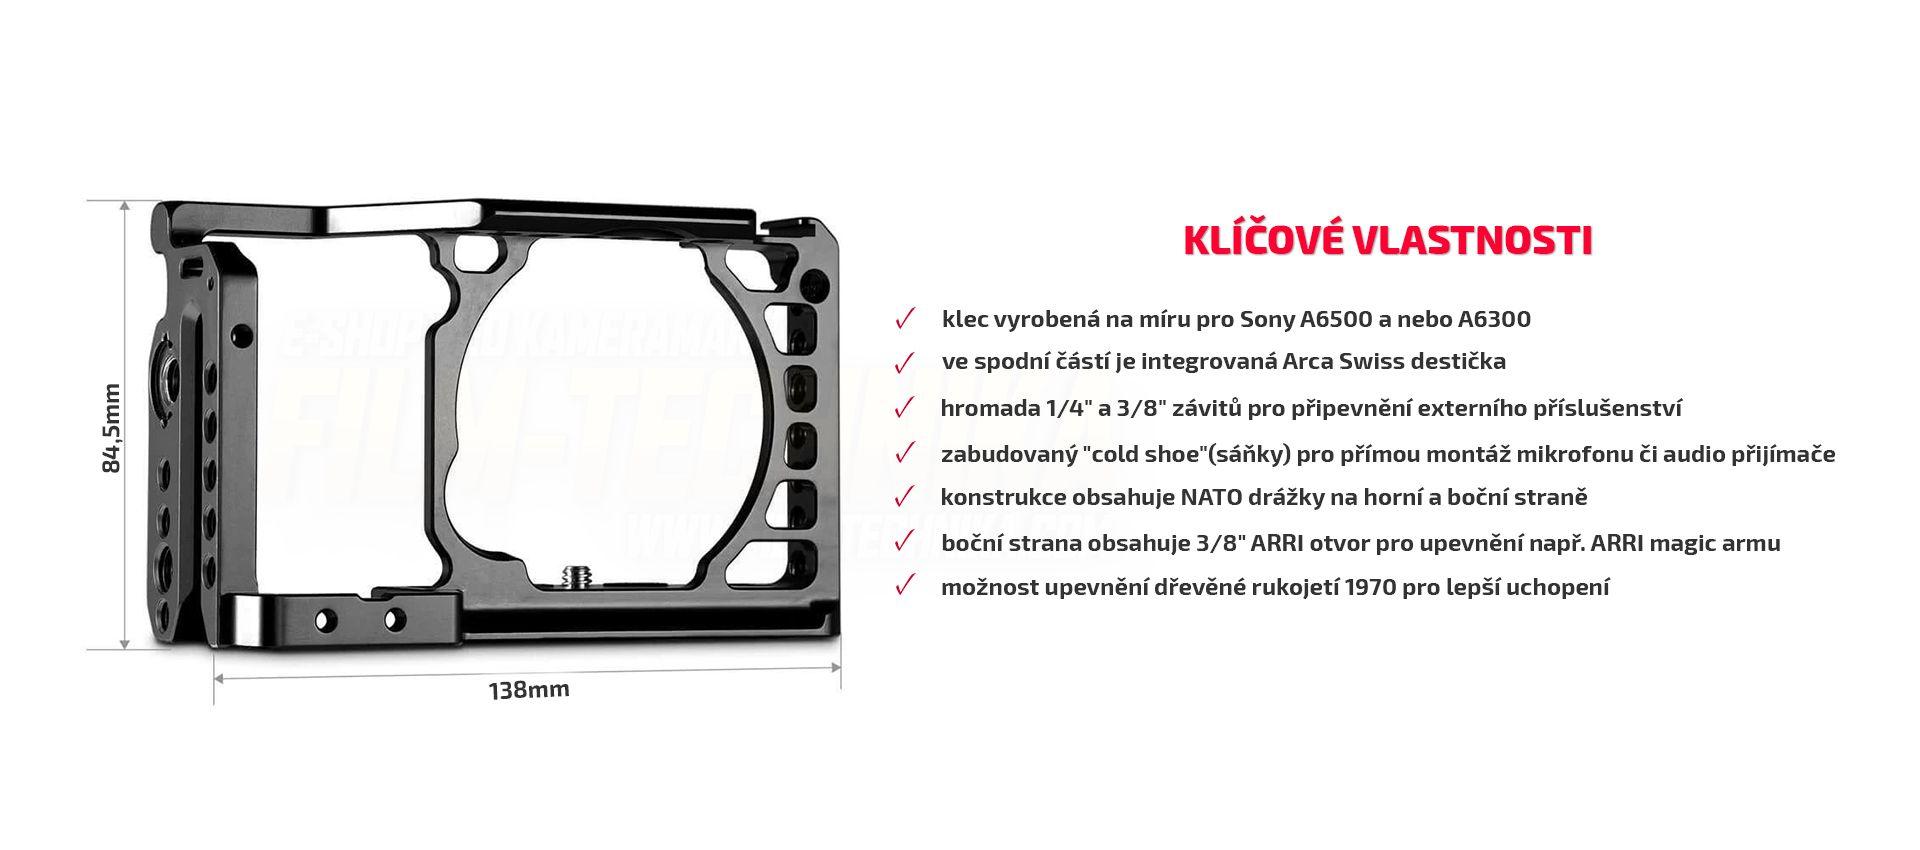 film-technika-smallrog-a5000-klec-2intext2